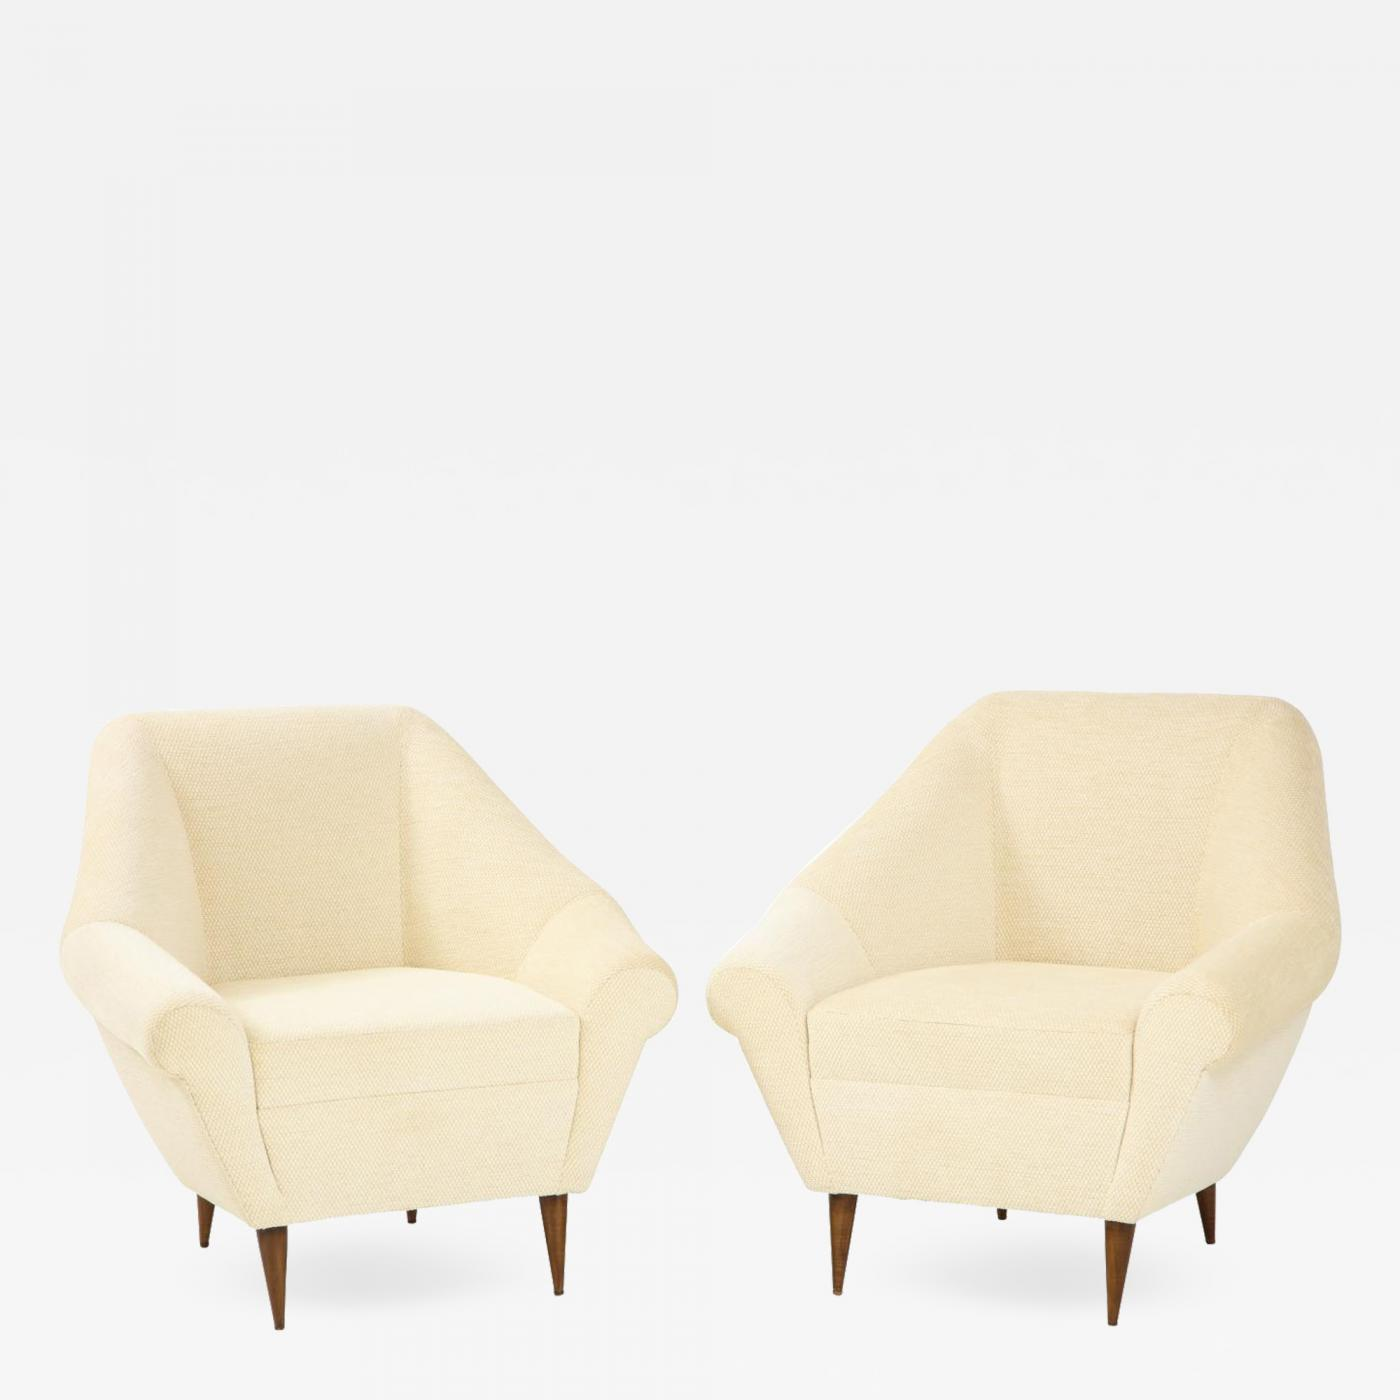 Pair of Italian Mid Century Modern Club Chairs